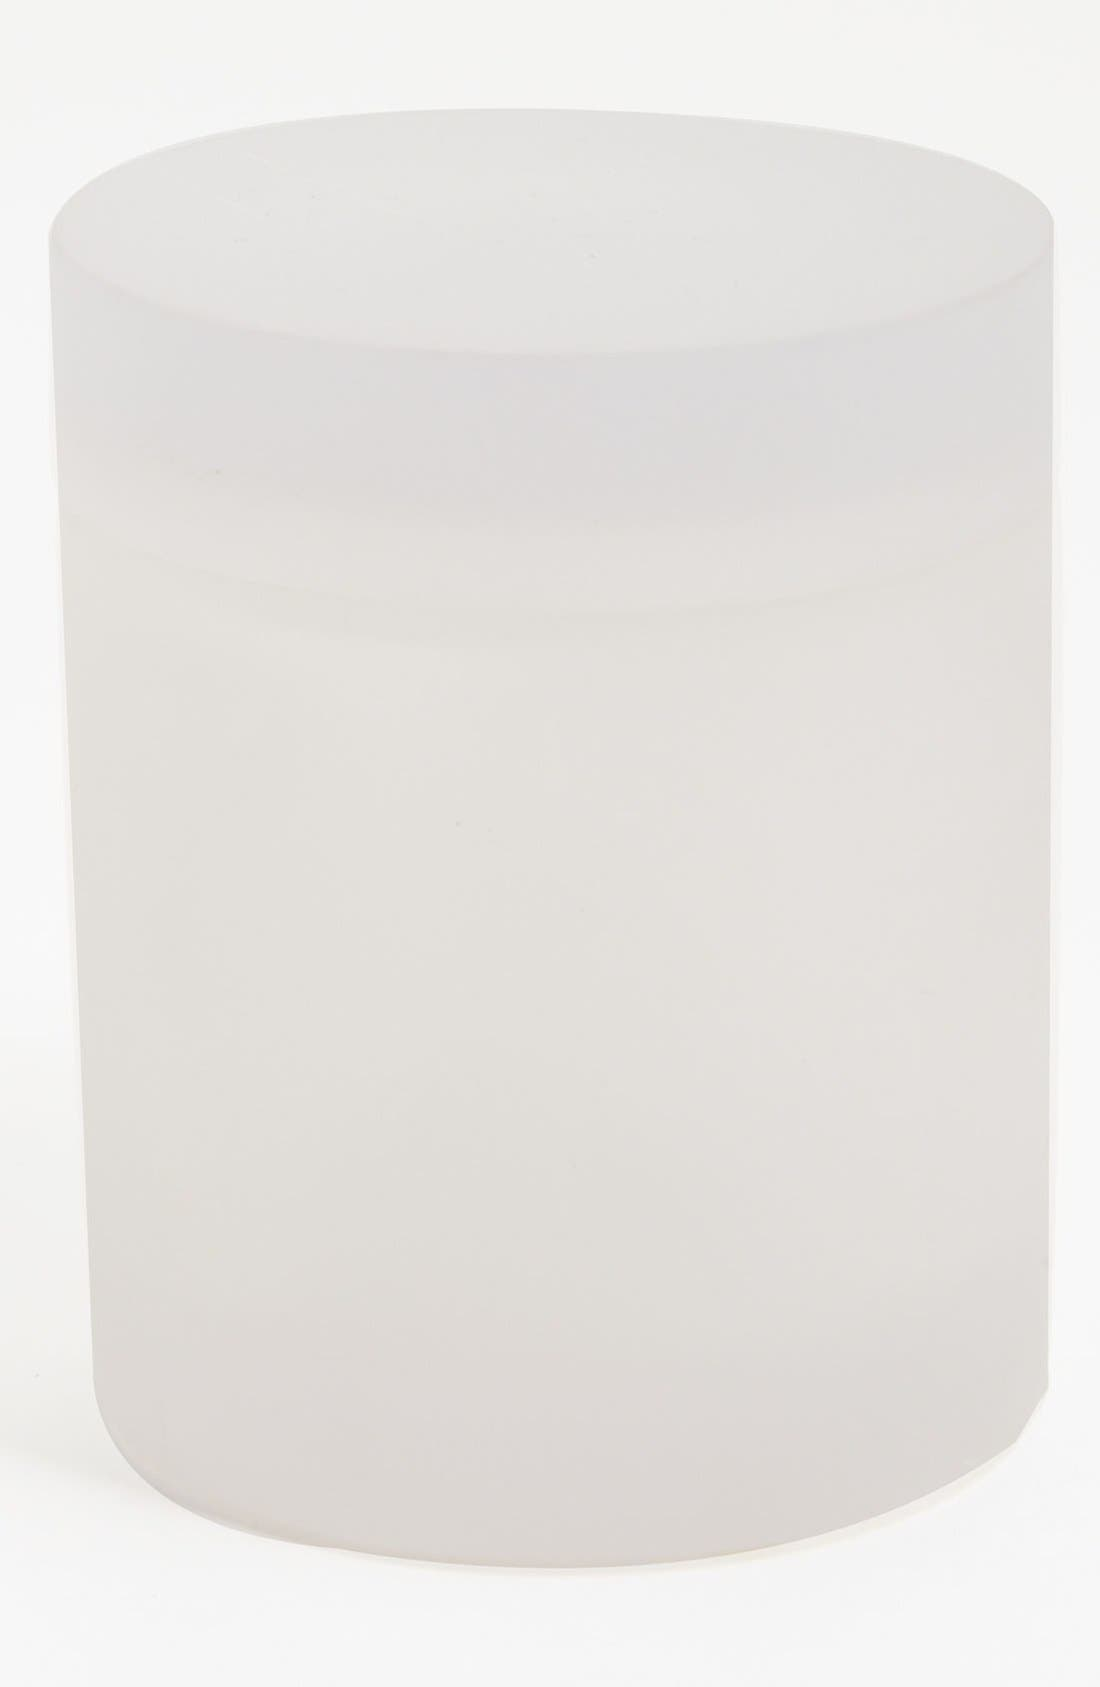 Alternate Image 1 Selected - Waterworks Studio 'Oxygen' Covered Jar (Online Only)